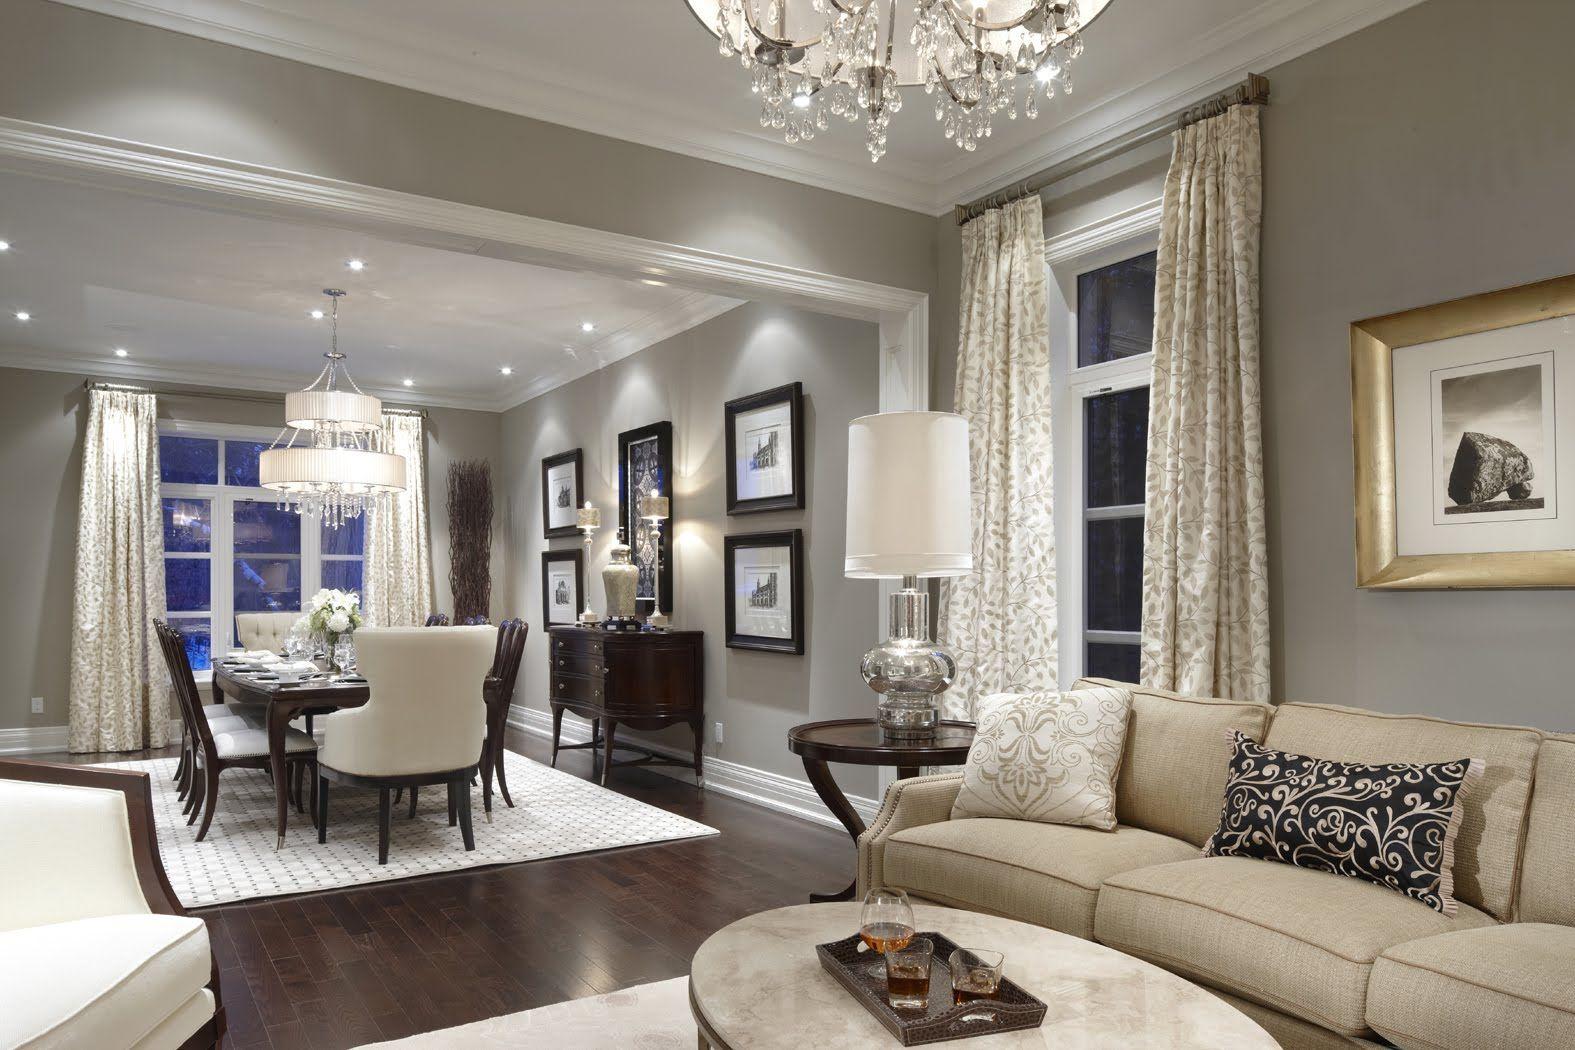 Benjamin Moore Colors For Your Living Room Decor Beige